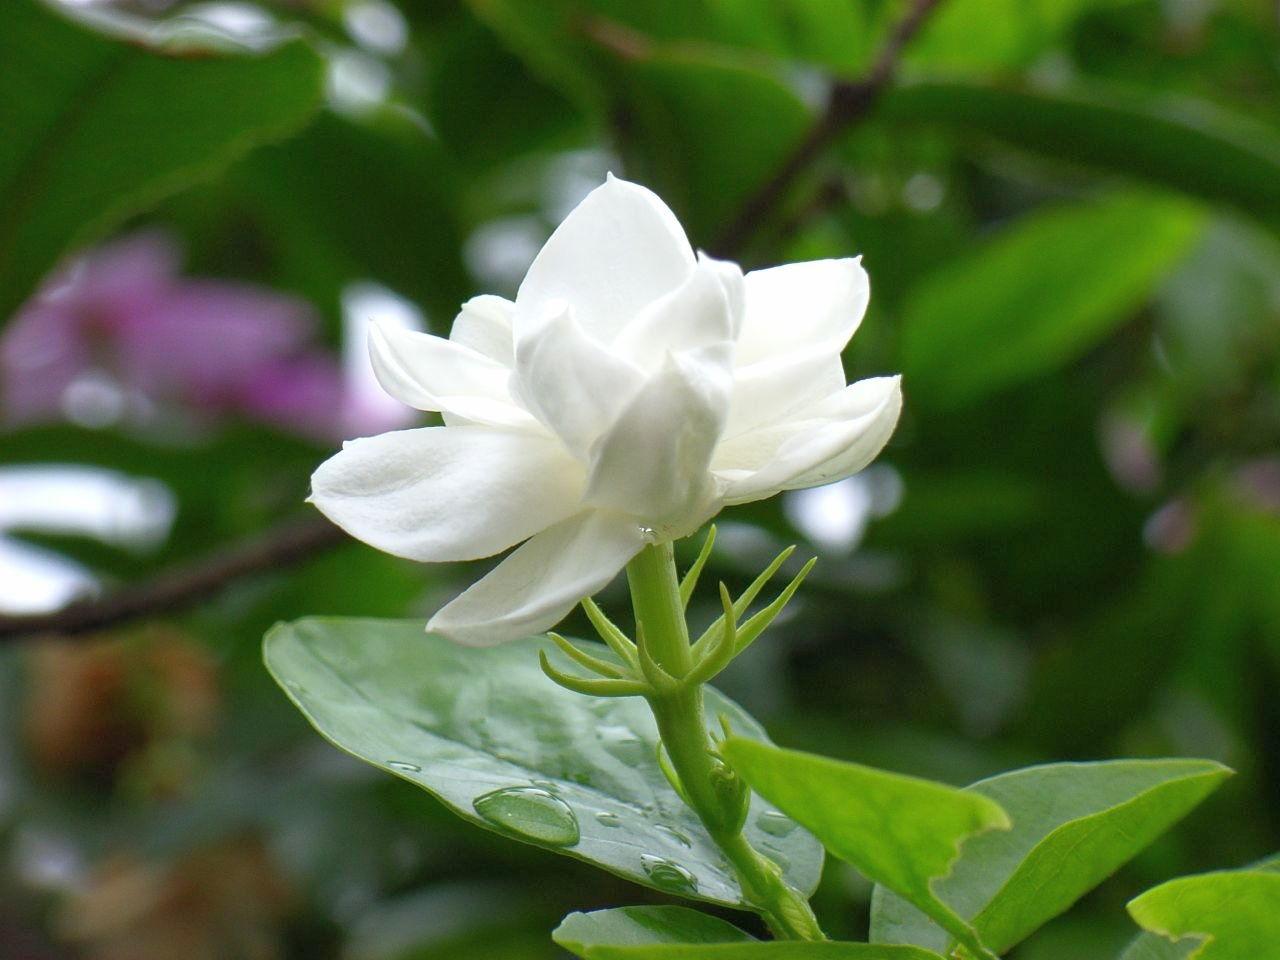 Natural Flower Image Downloading , HD Wallpaper & Backgrounds